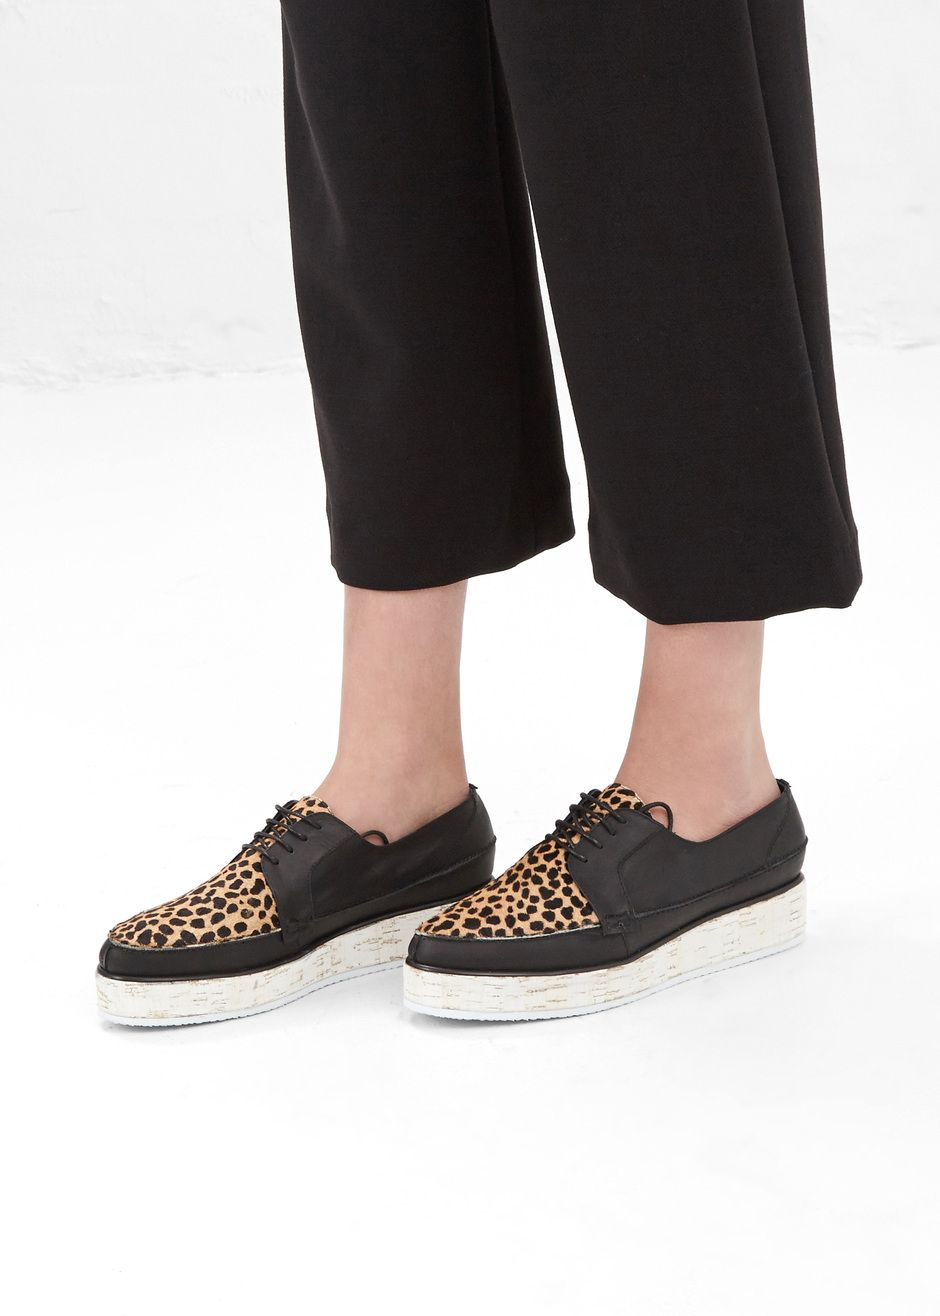 RACHEL COMEY Sneakers cheap sale brand new unisex 4RCCqNks2M